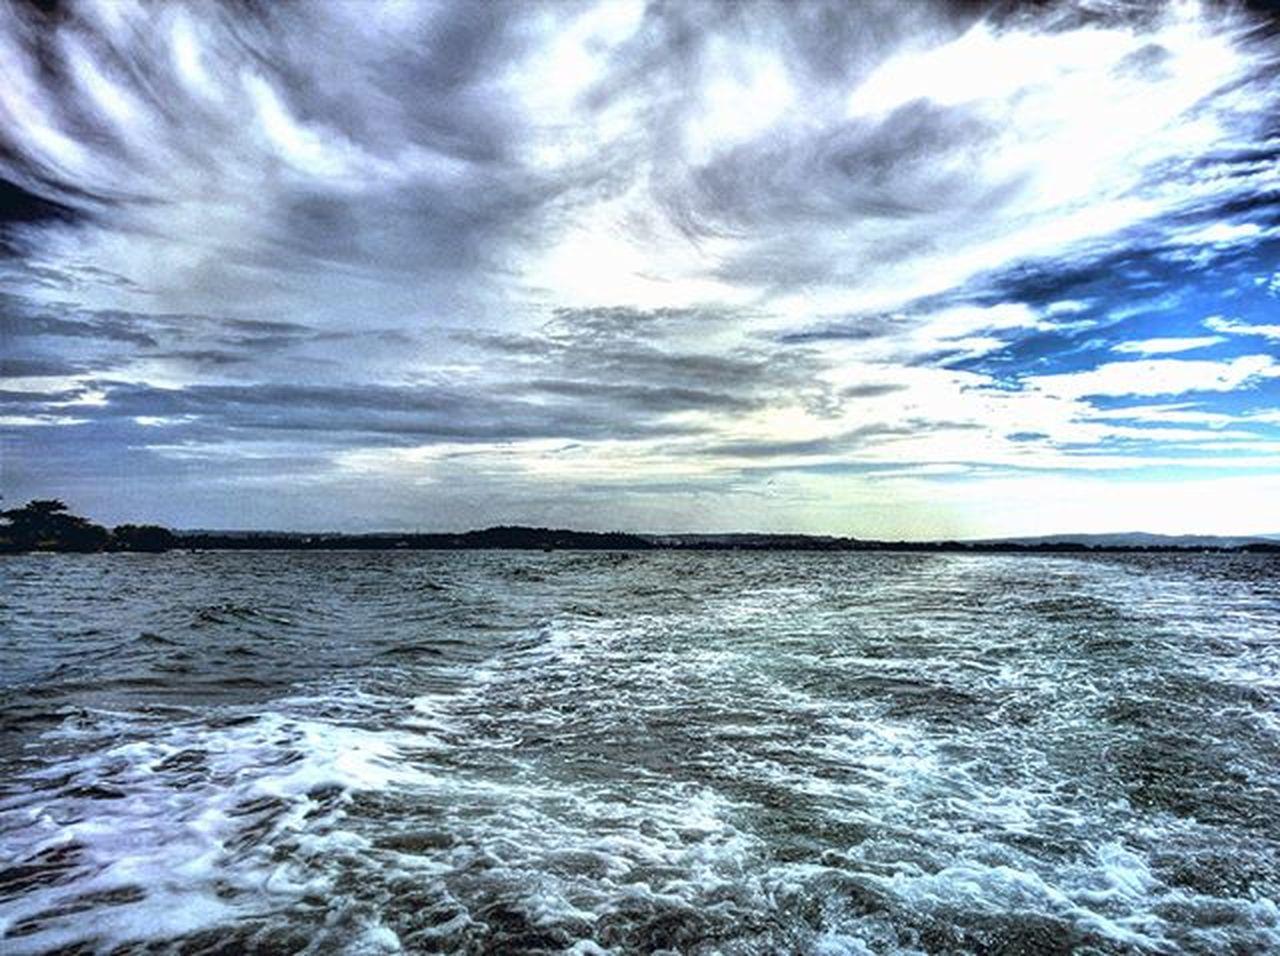 Blue skies, white clouds and the sea. Slow ride for a sun-tan to Koh Rong Samloem. Lumia930 Mobilephotography WindowsPhonePhotography WeLoveLumia ShotOnMyLumia  Lumiaography Theappwhisperer Makemoments MoreLumiaLove GoodRadShot TheLumians Fhotoroom Lumia PicHitMe EyeEm EyeEm_O MenchFeature Photography Nban NbanFamily Pixelpanda Visitorg Aop_Lab Natgeo Natgeotravel NatGeoYourShot AdventureVisuals Cambodia PhnomPenh My_Mobile_Photography @fhotoroom_ @thelumians @lumiavoices @pichitme @windowsphonephotography @microsoftwindowsphone @microsoftlumiaphotography @mobile_photography @moment_lens @goodradshot @mobilephotoblog @street_hunters @lumia @pixel_panda_ @eyeem_o @photocrowd @photoadvices @nothingbutanokia @worldphotoorg